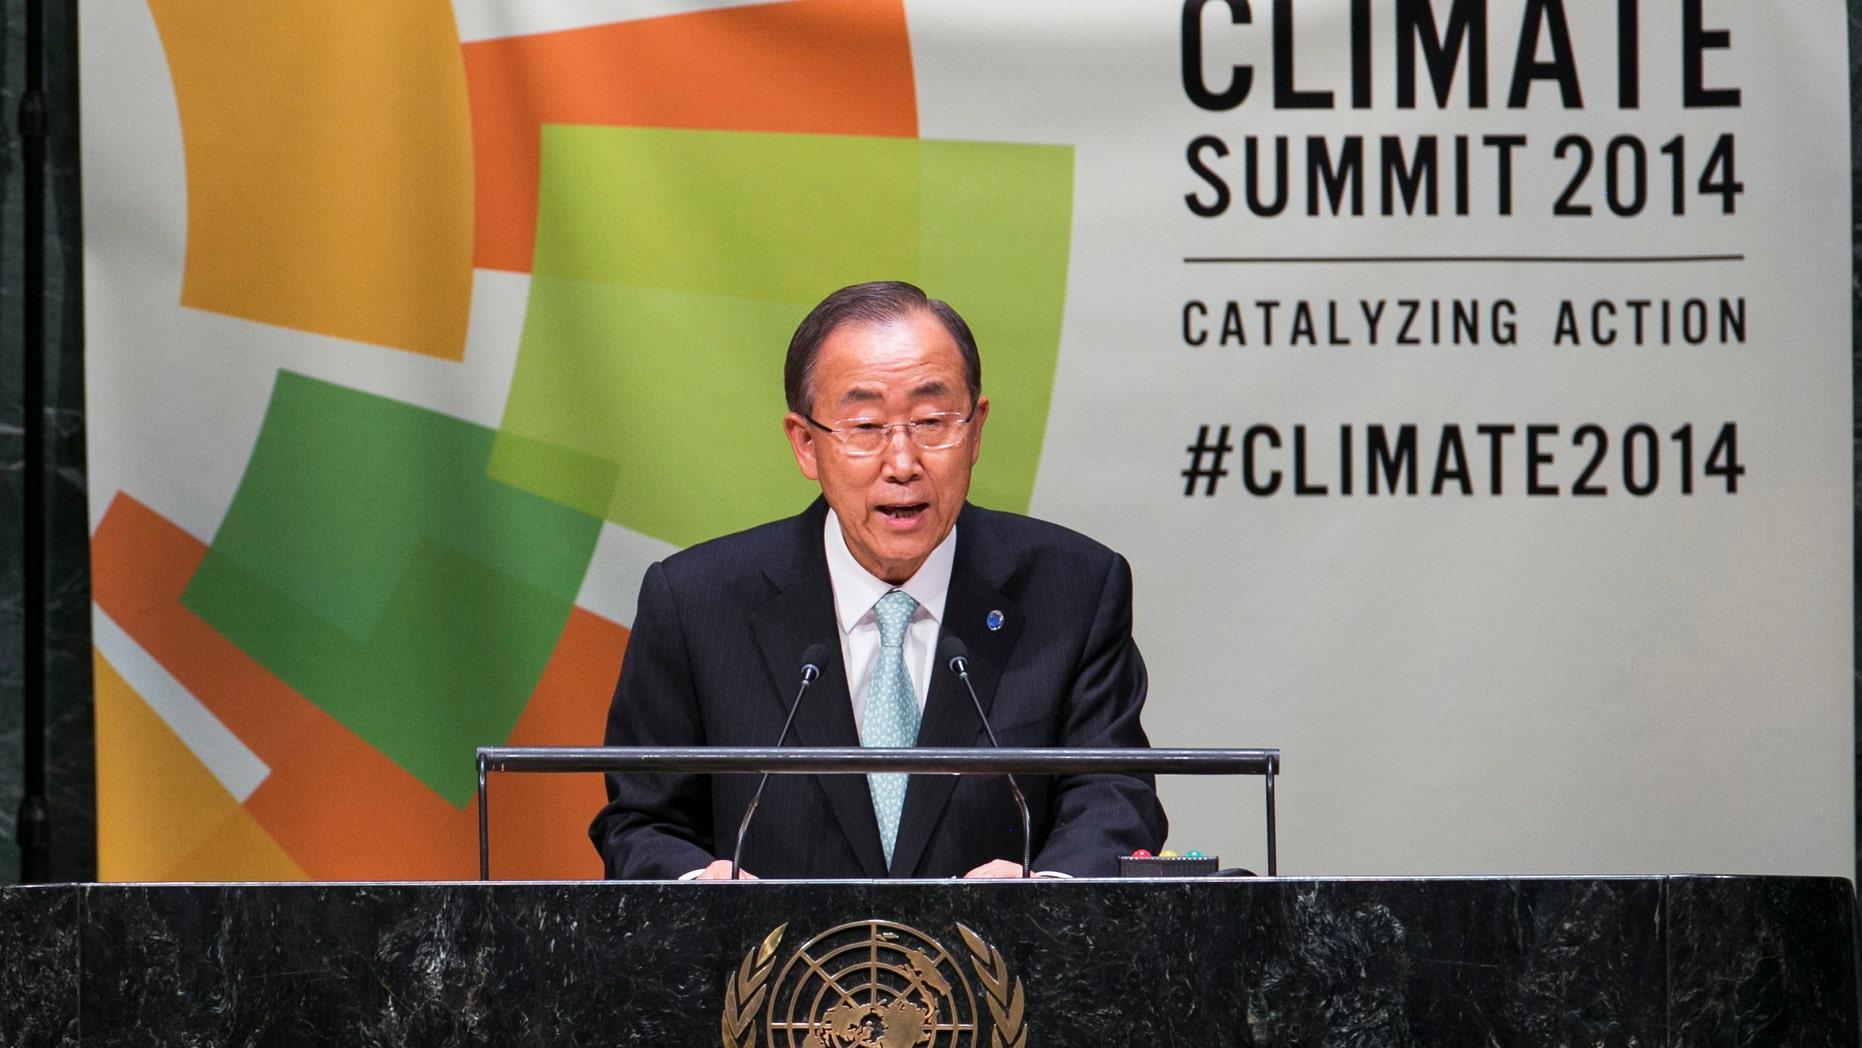 U.N. Secretary General Ban Ki-moon speaks during the Climate Summit.